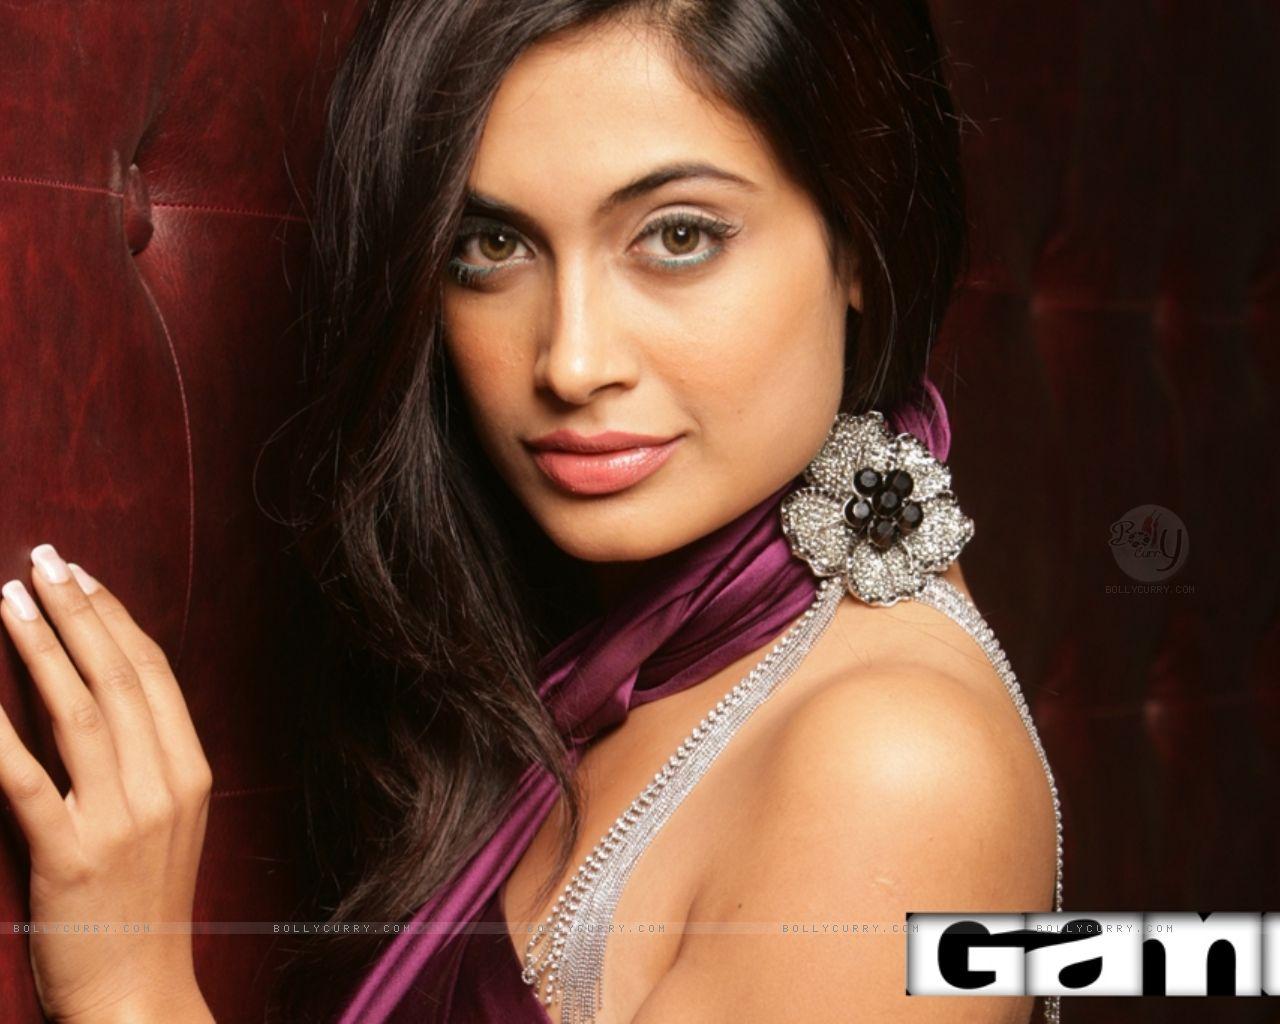 Kiss Wallpaper Boy And Girl Bollywood Acterss Images Sara Jane Dias Images